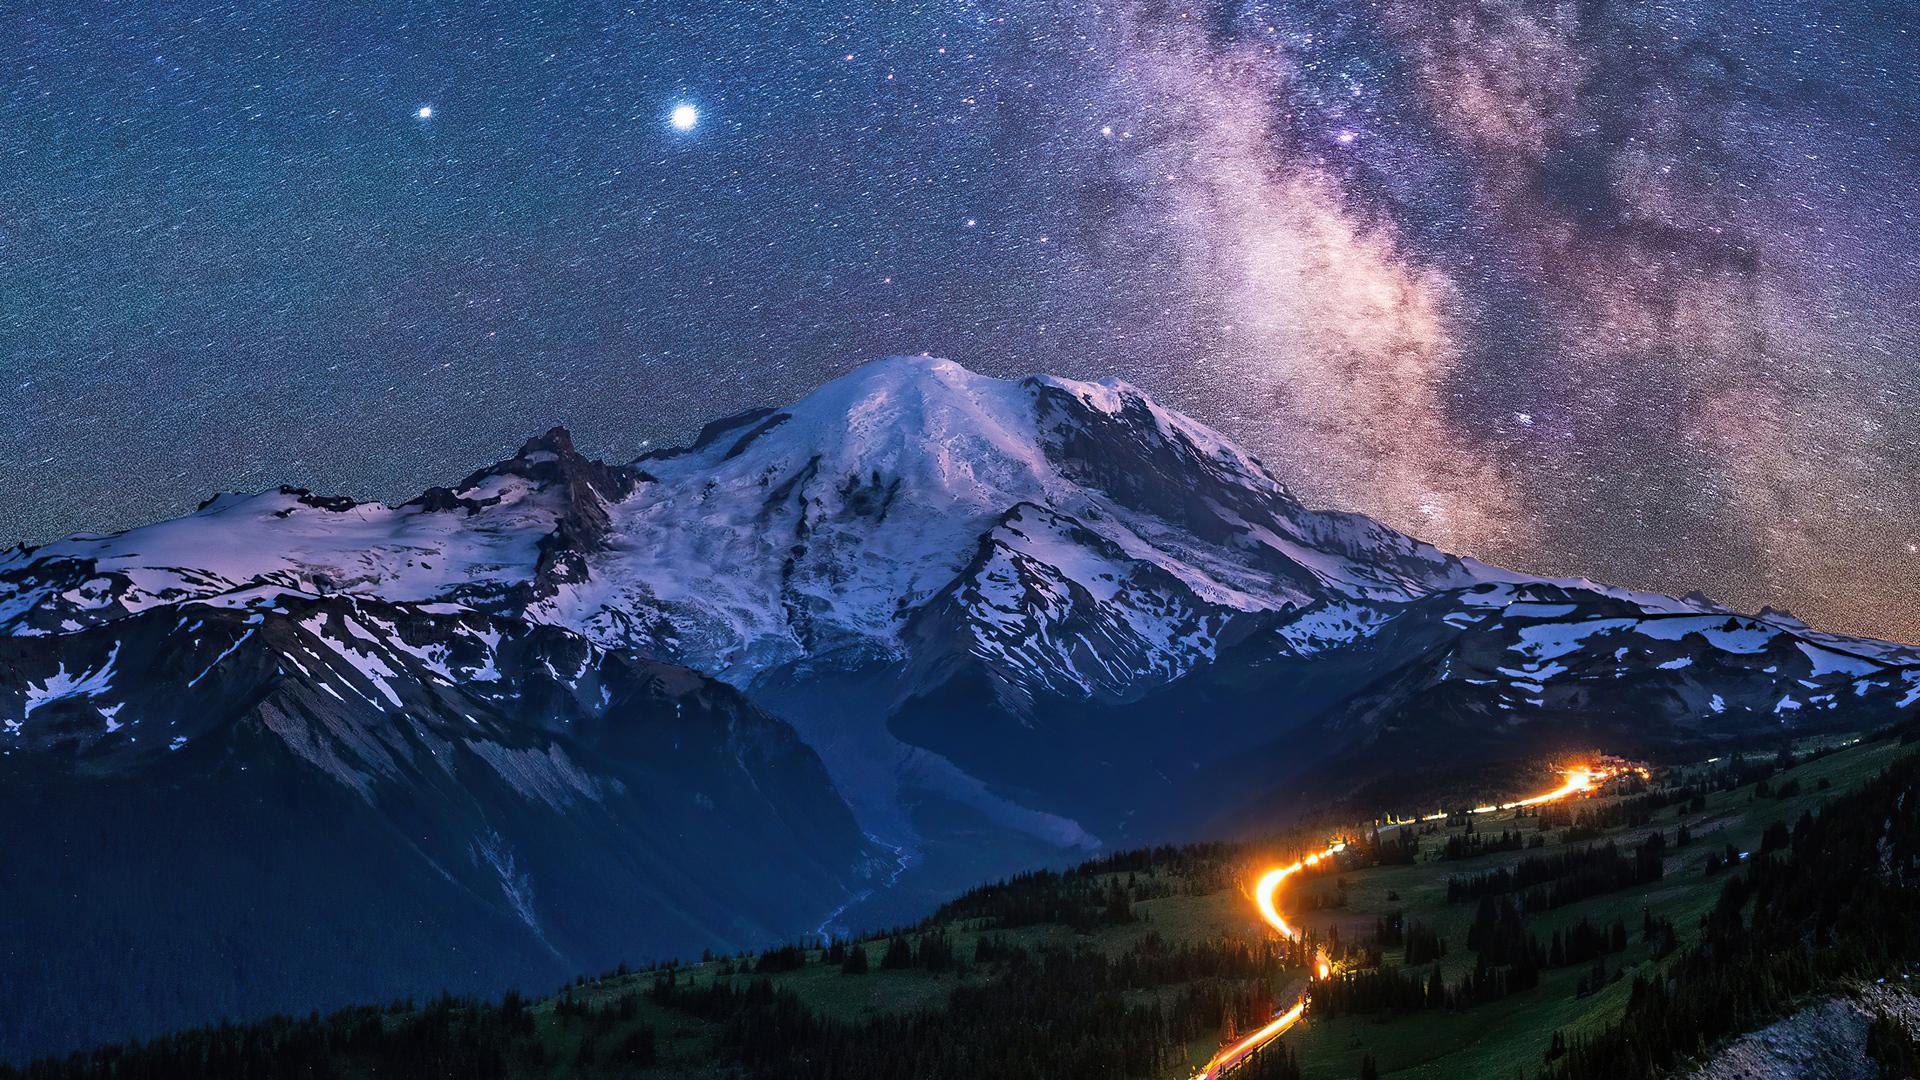 milky-way-over-mountains-4k-fl.jpg